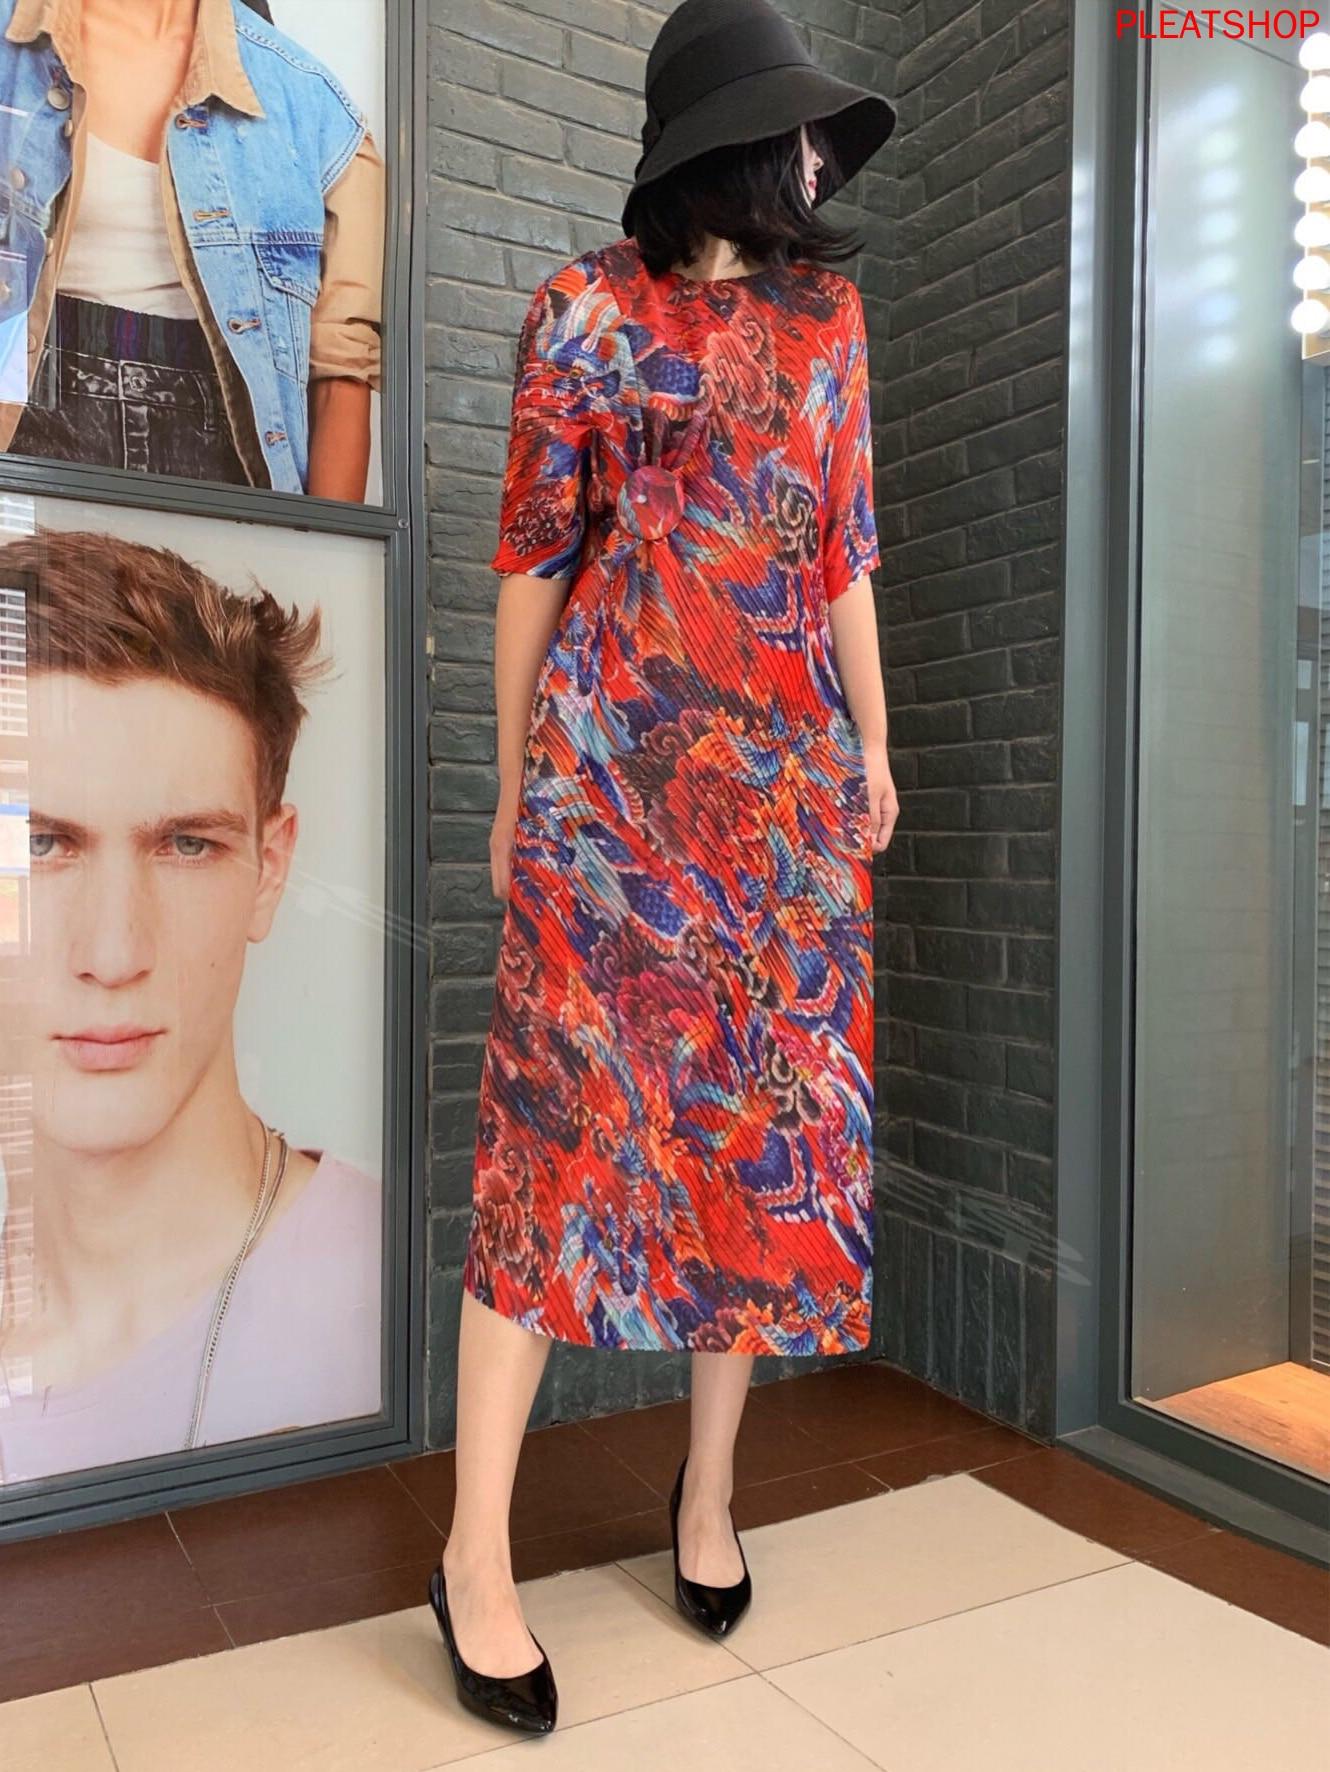 Miyake Pleats Summer New Dress Dragon And Phoenix Printed Mid-Length Slim-Fit dress women elegant vestidos women clothes